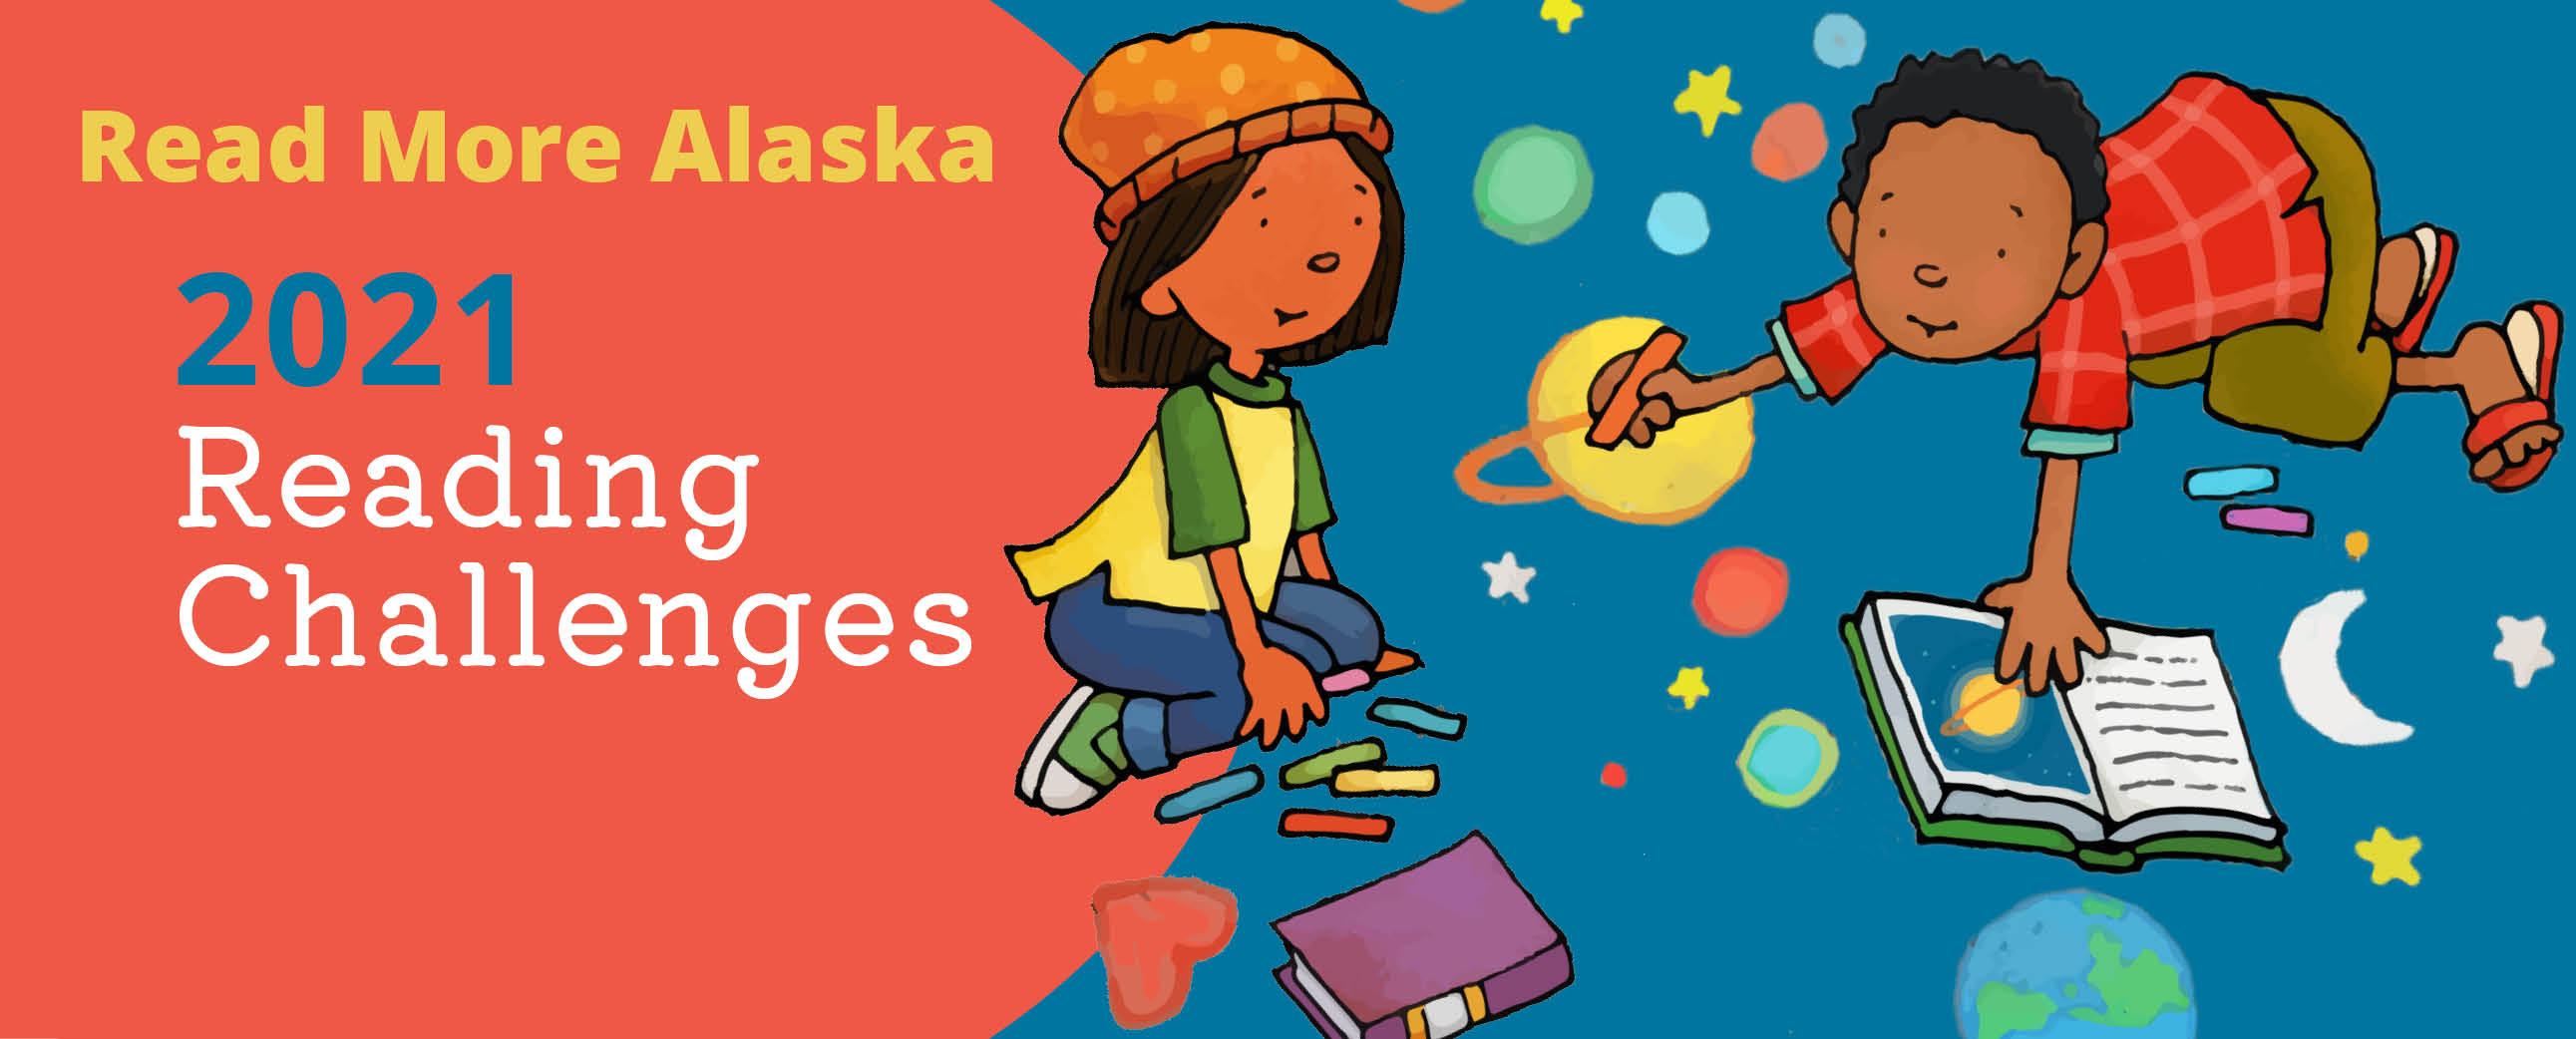 Read More Alaska 2021 Summer Reading Challenges